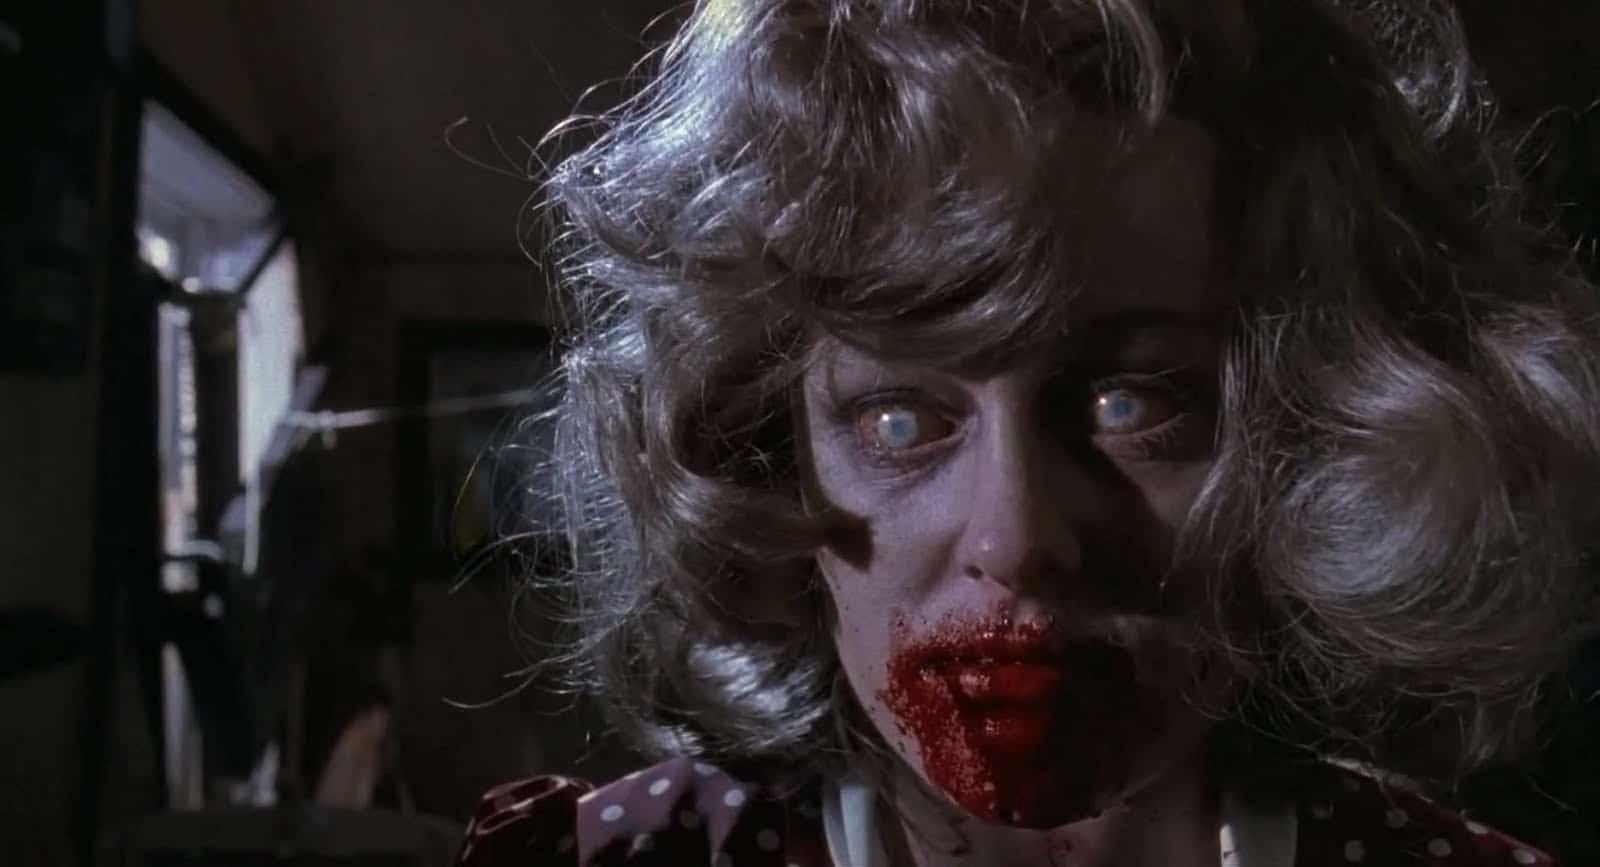 Dead Alive AKA Braindead – zombie movie